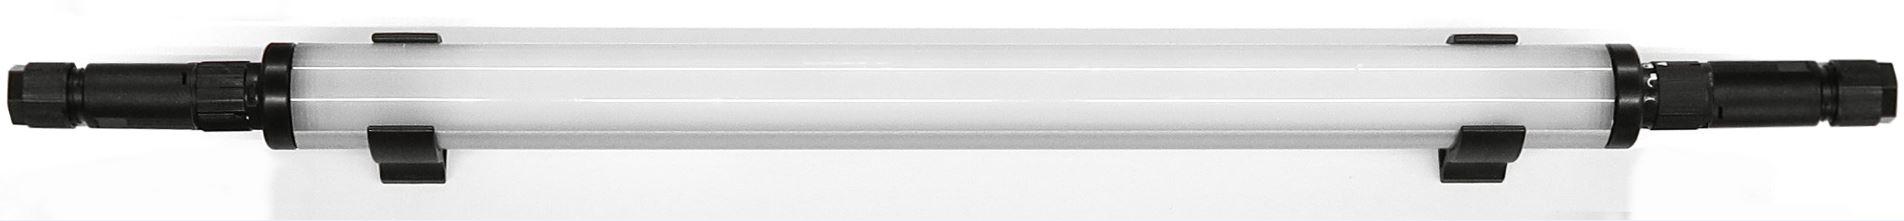 Serie 23 LED: 6 Watt/  24-42 Volt AC/DC/ 530 mm  (DU m. Steckverb)